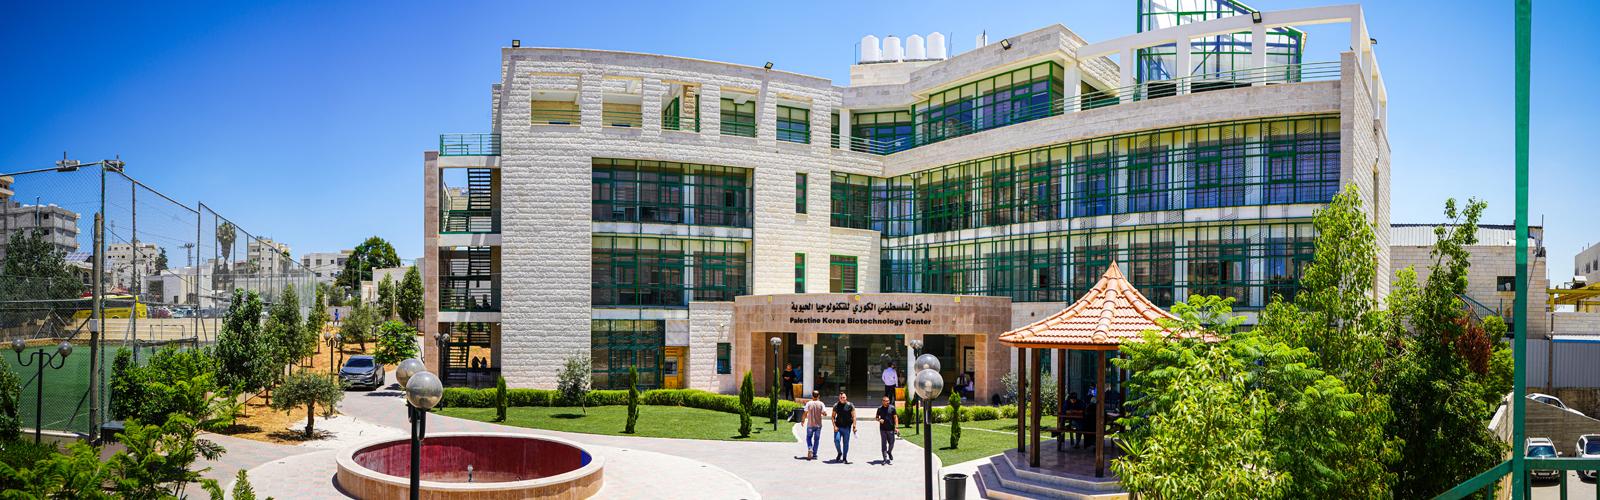 Palestine Polytechnic University (PPU) - أهلا وسهلا بكم في جامعة بوليتكنك فلسطين